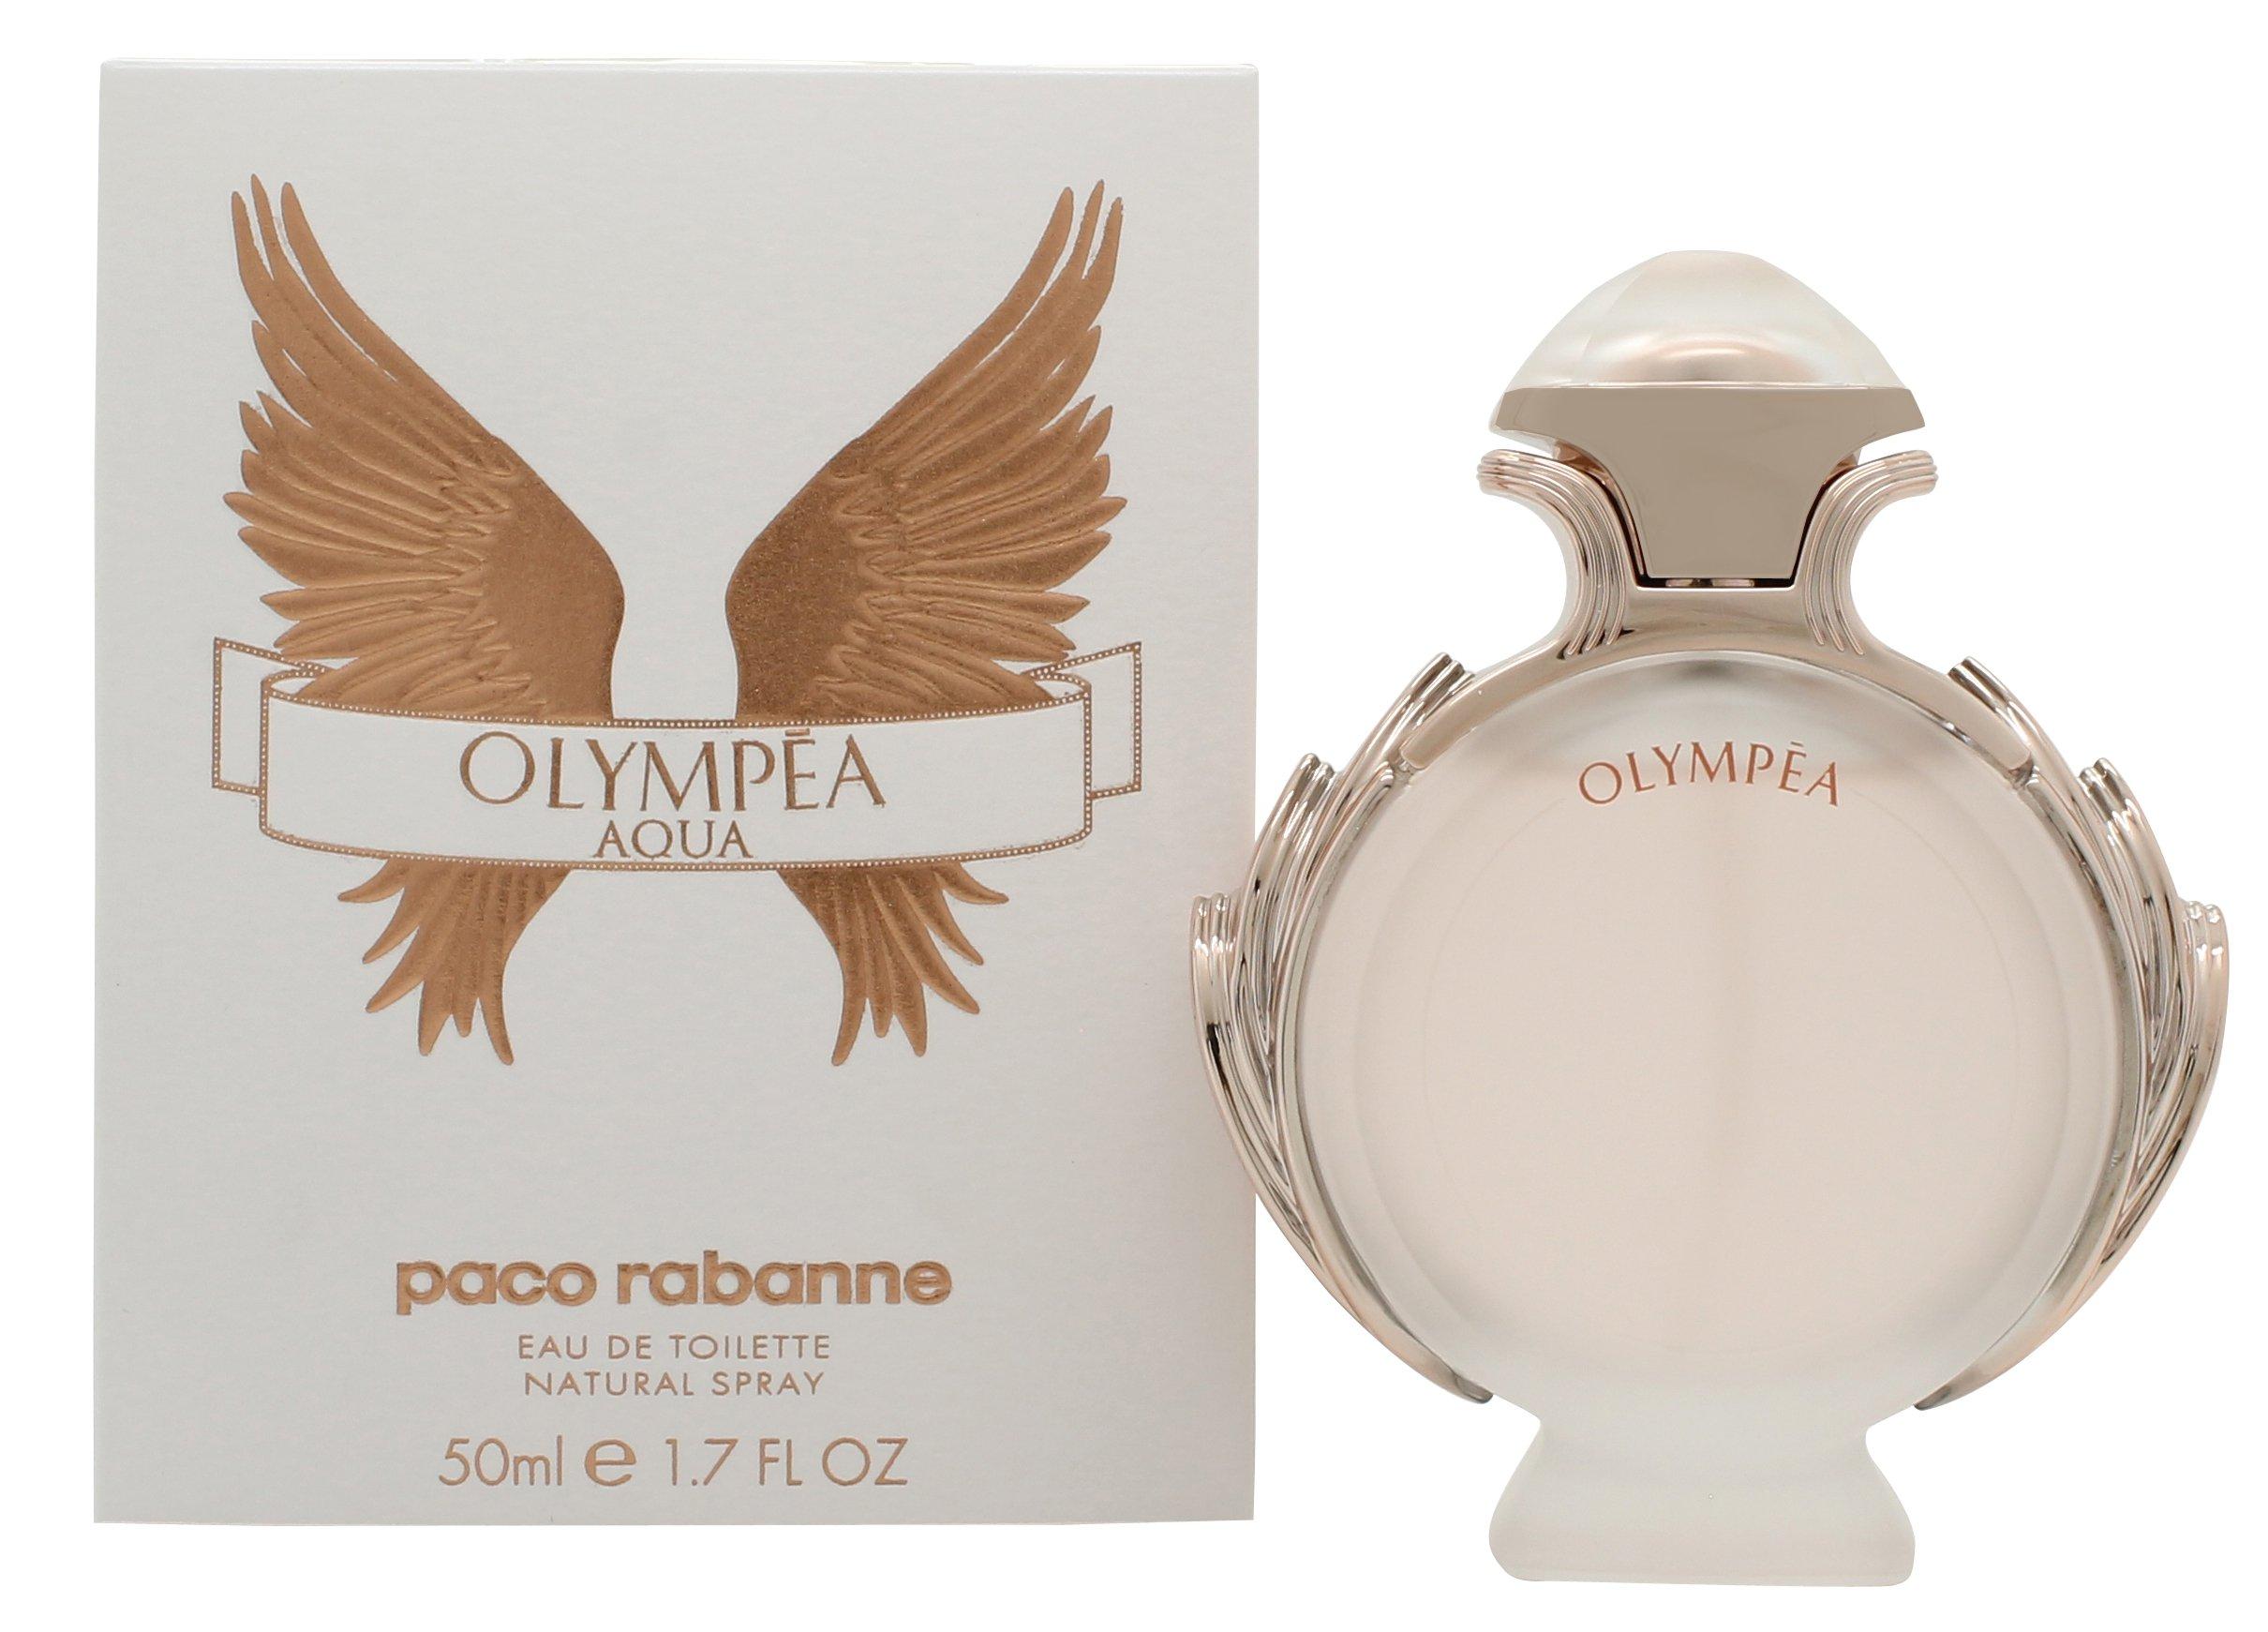 Paco Rabanne Olympéa Aqua Eau de Toilette – 50 ml